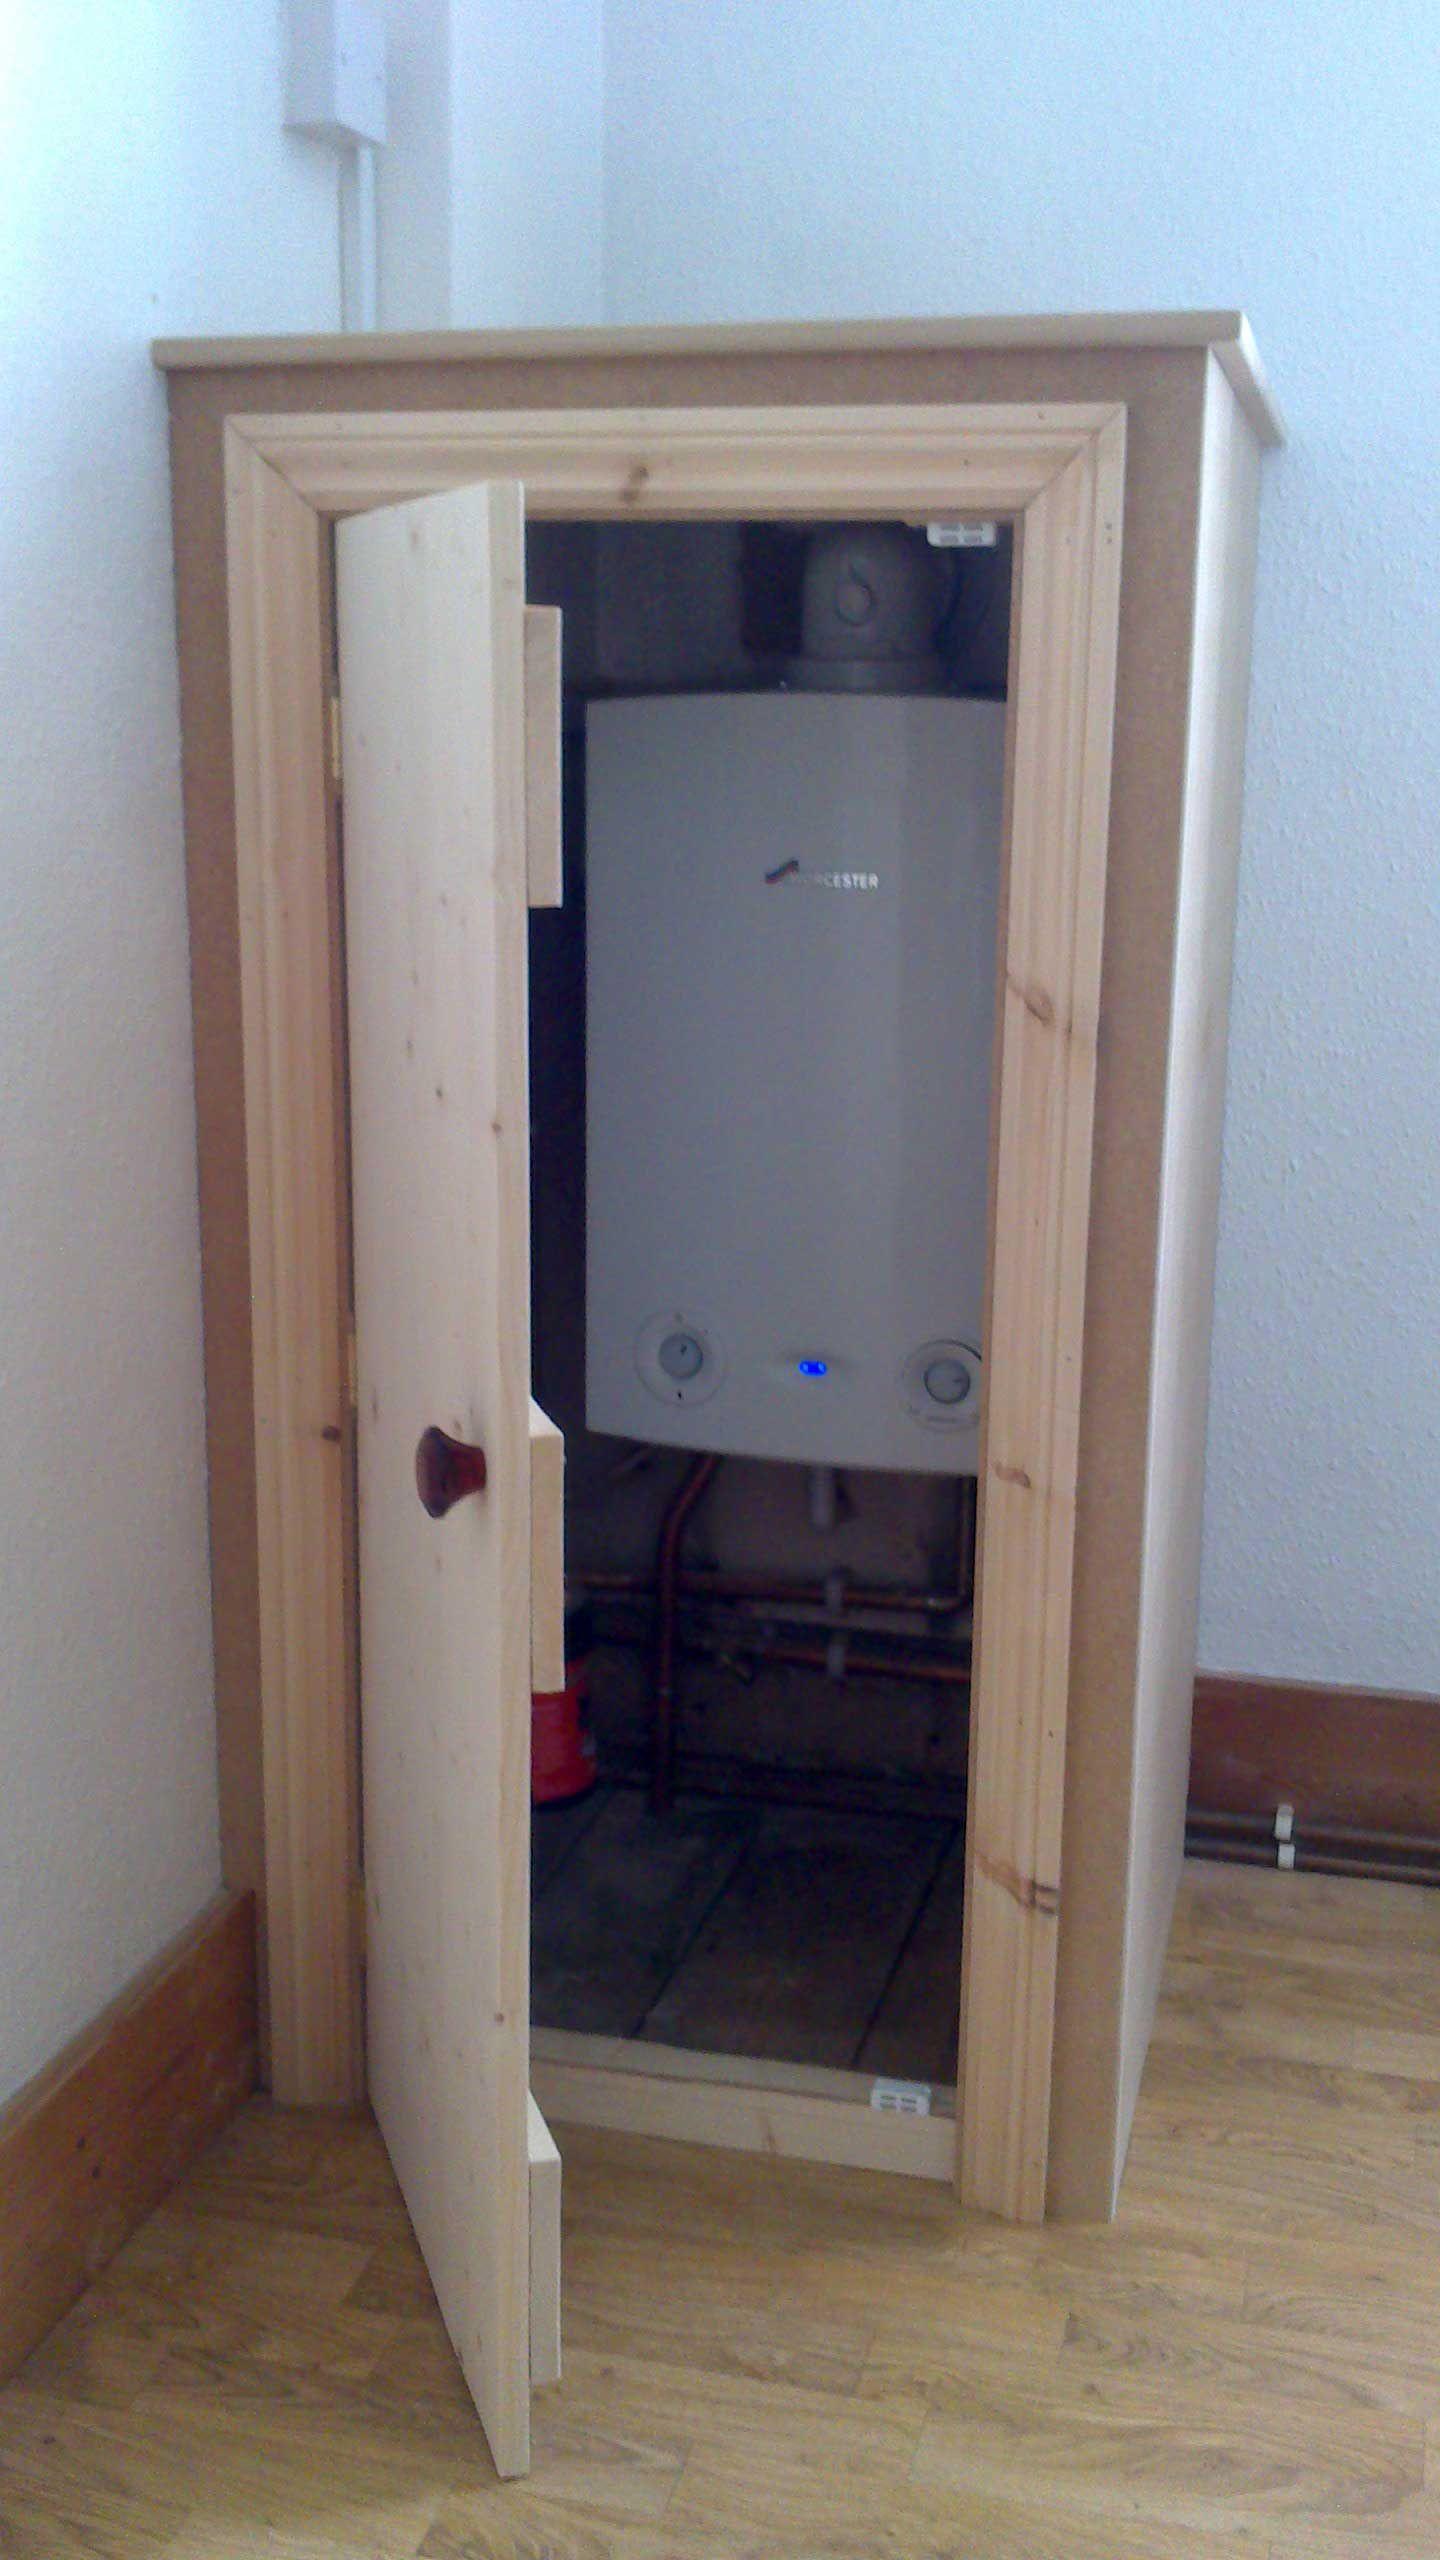 Boiler Cupboard Google Search Bathroom Layout Under Stairs Cupboard Airing Cupboard